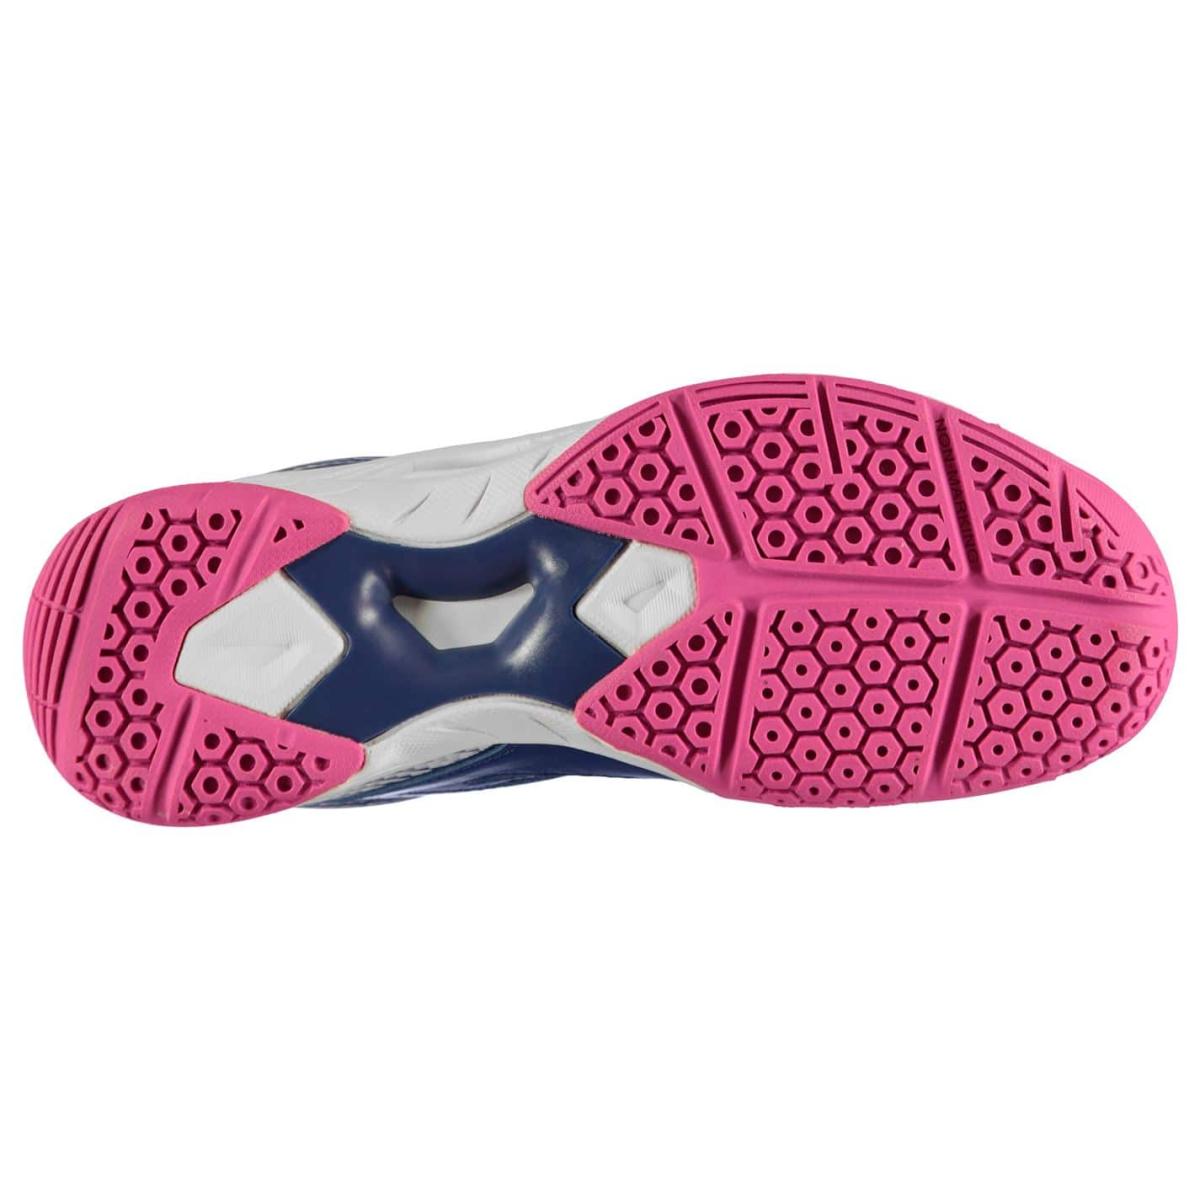 Slazenger-Turnschuhe-Damen-Sneaker-Sportschuhe-Laufschuhe-Velocity-7035 Indexbild 3